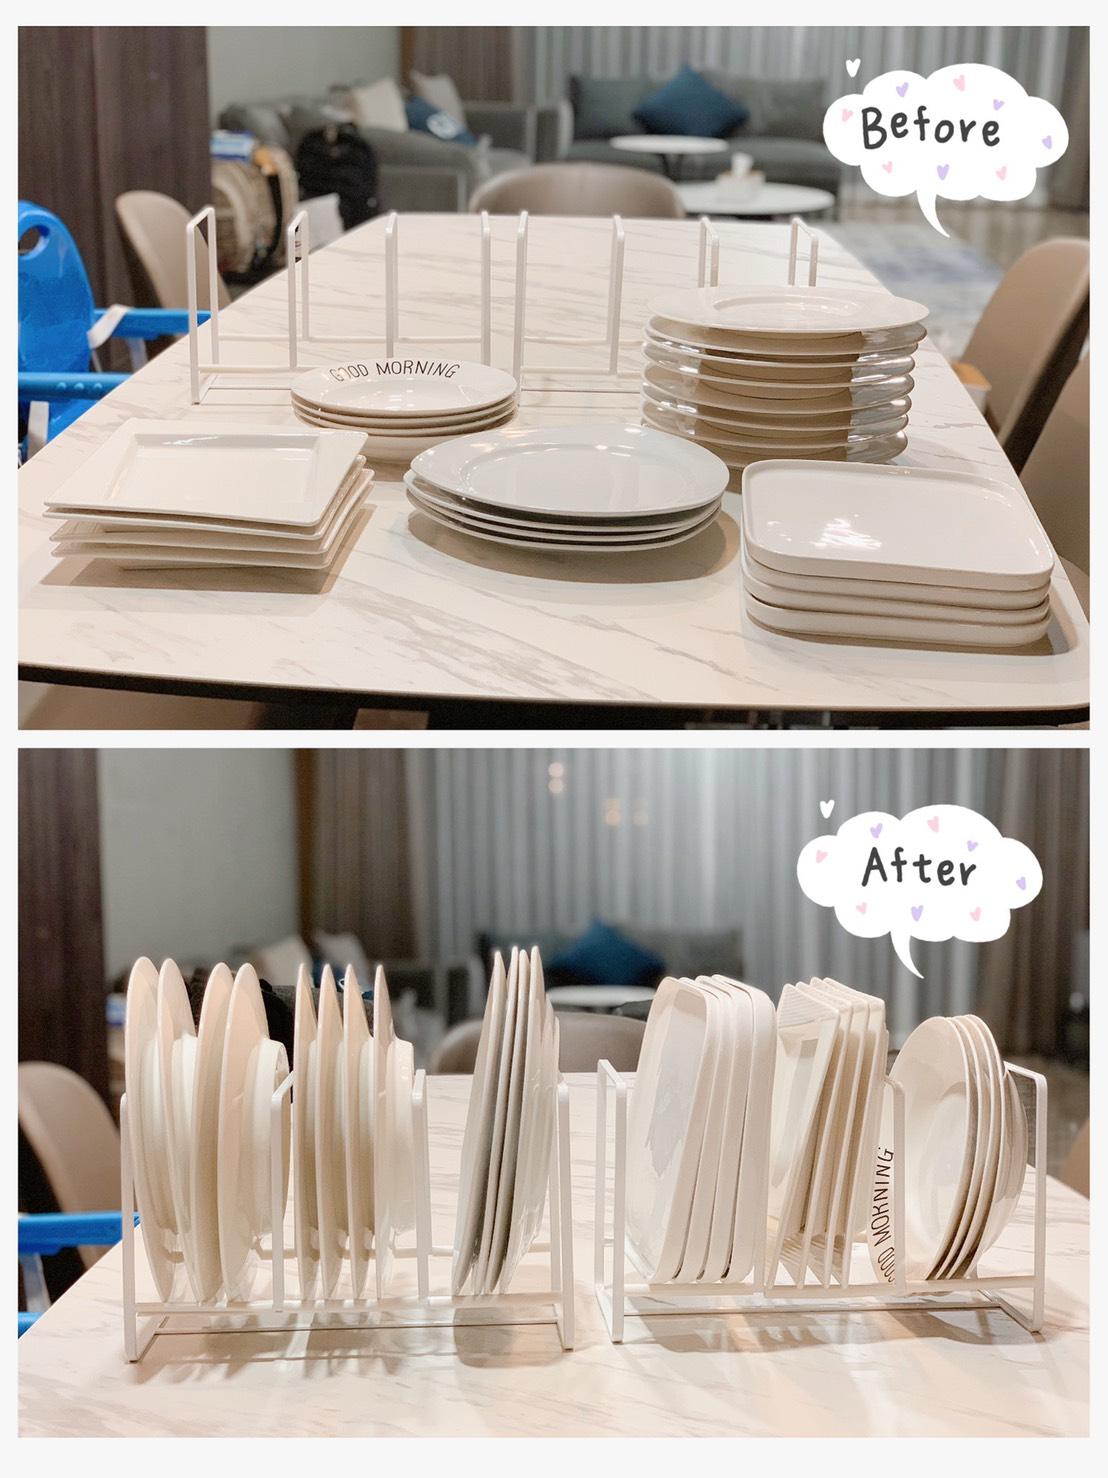 tower三格日系框型盤架S(白) 山崎收納 Yamazaki 廚房收納 盤架